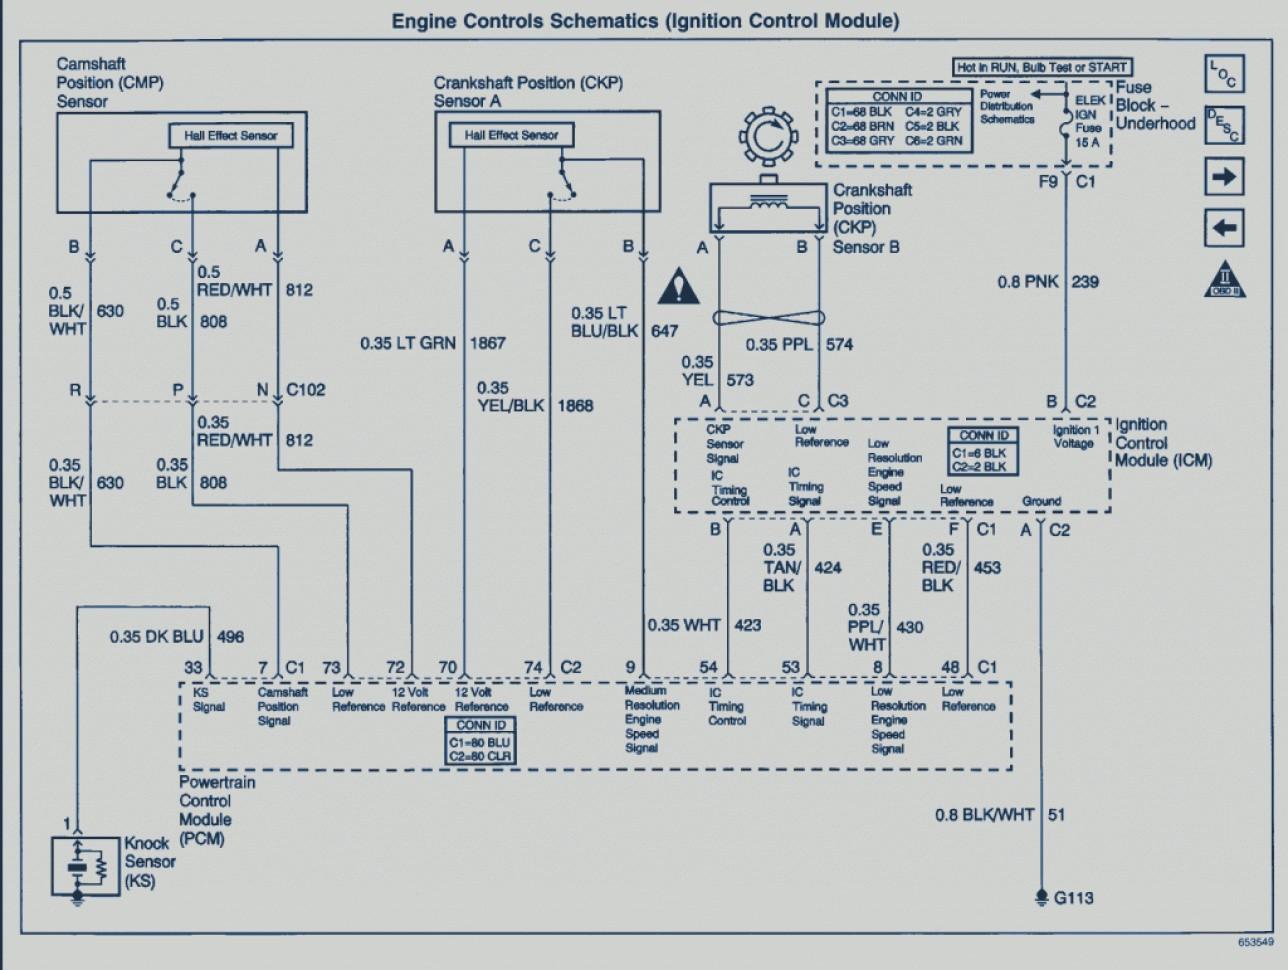 grand prix monsoon stereo wiring diagram wiring diagram 2000 pontiac grand prix wiring-diagram 2006 pontiac grand prix wiring diagram #3